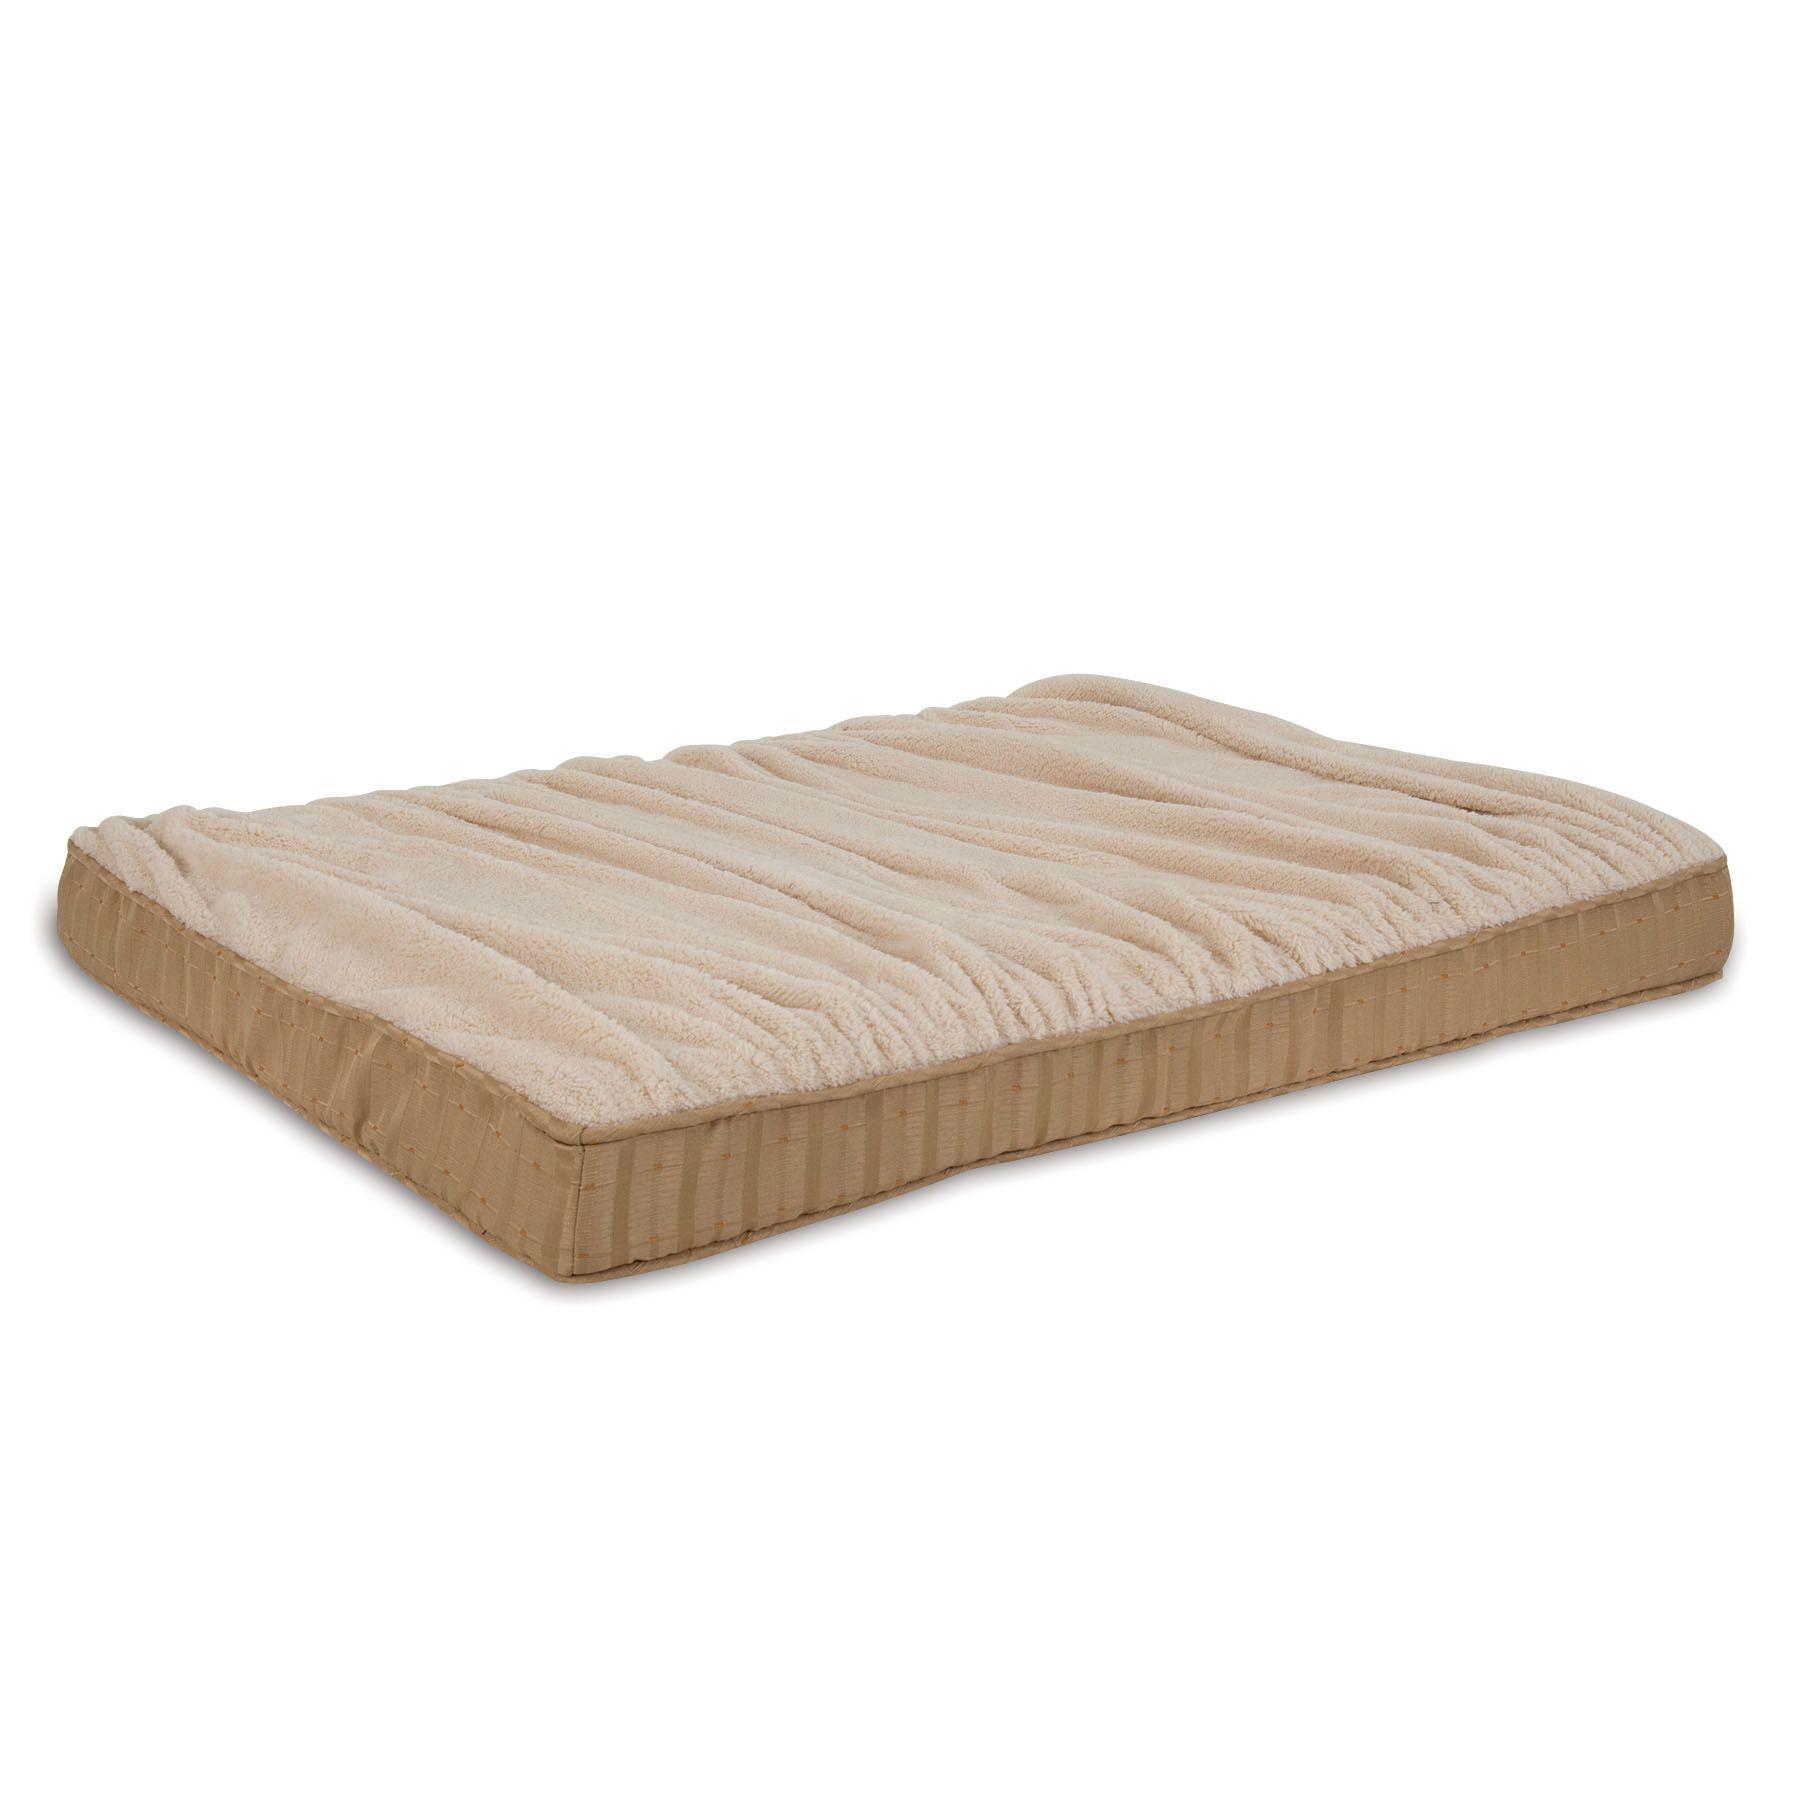 Petmate Dig and Burrow Orthopedic Bed